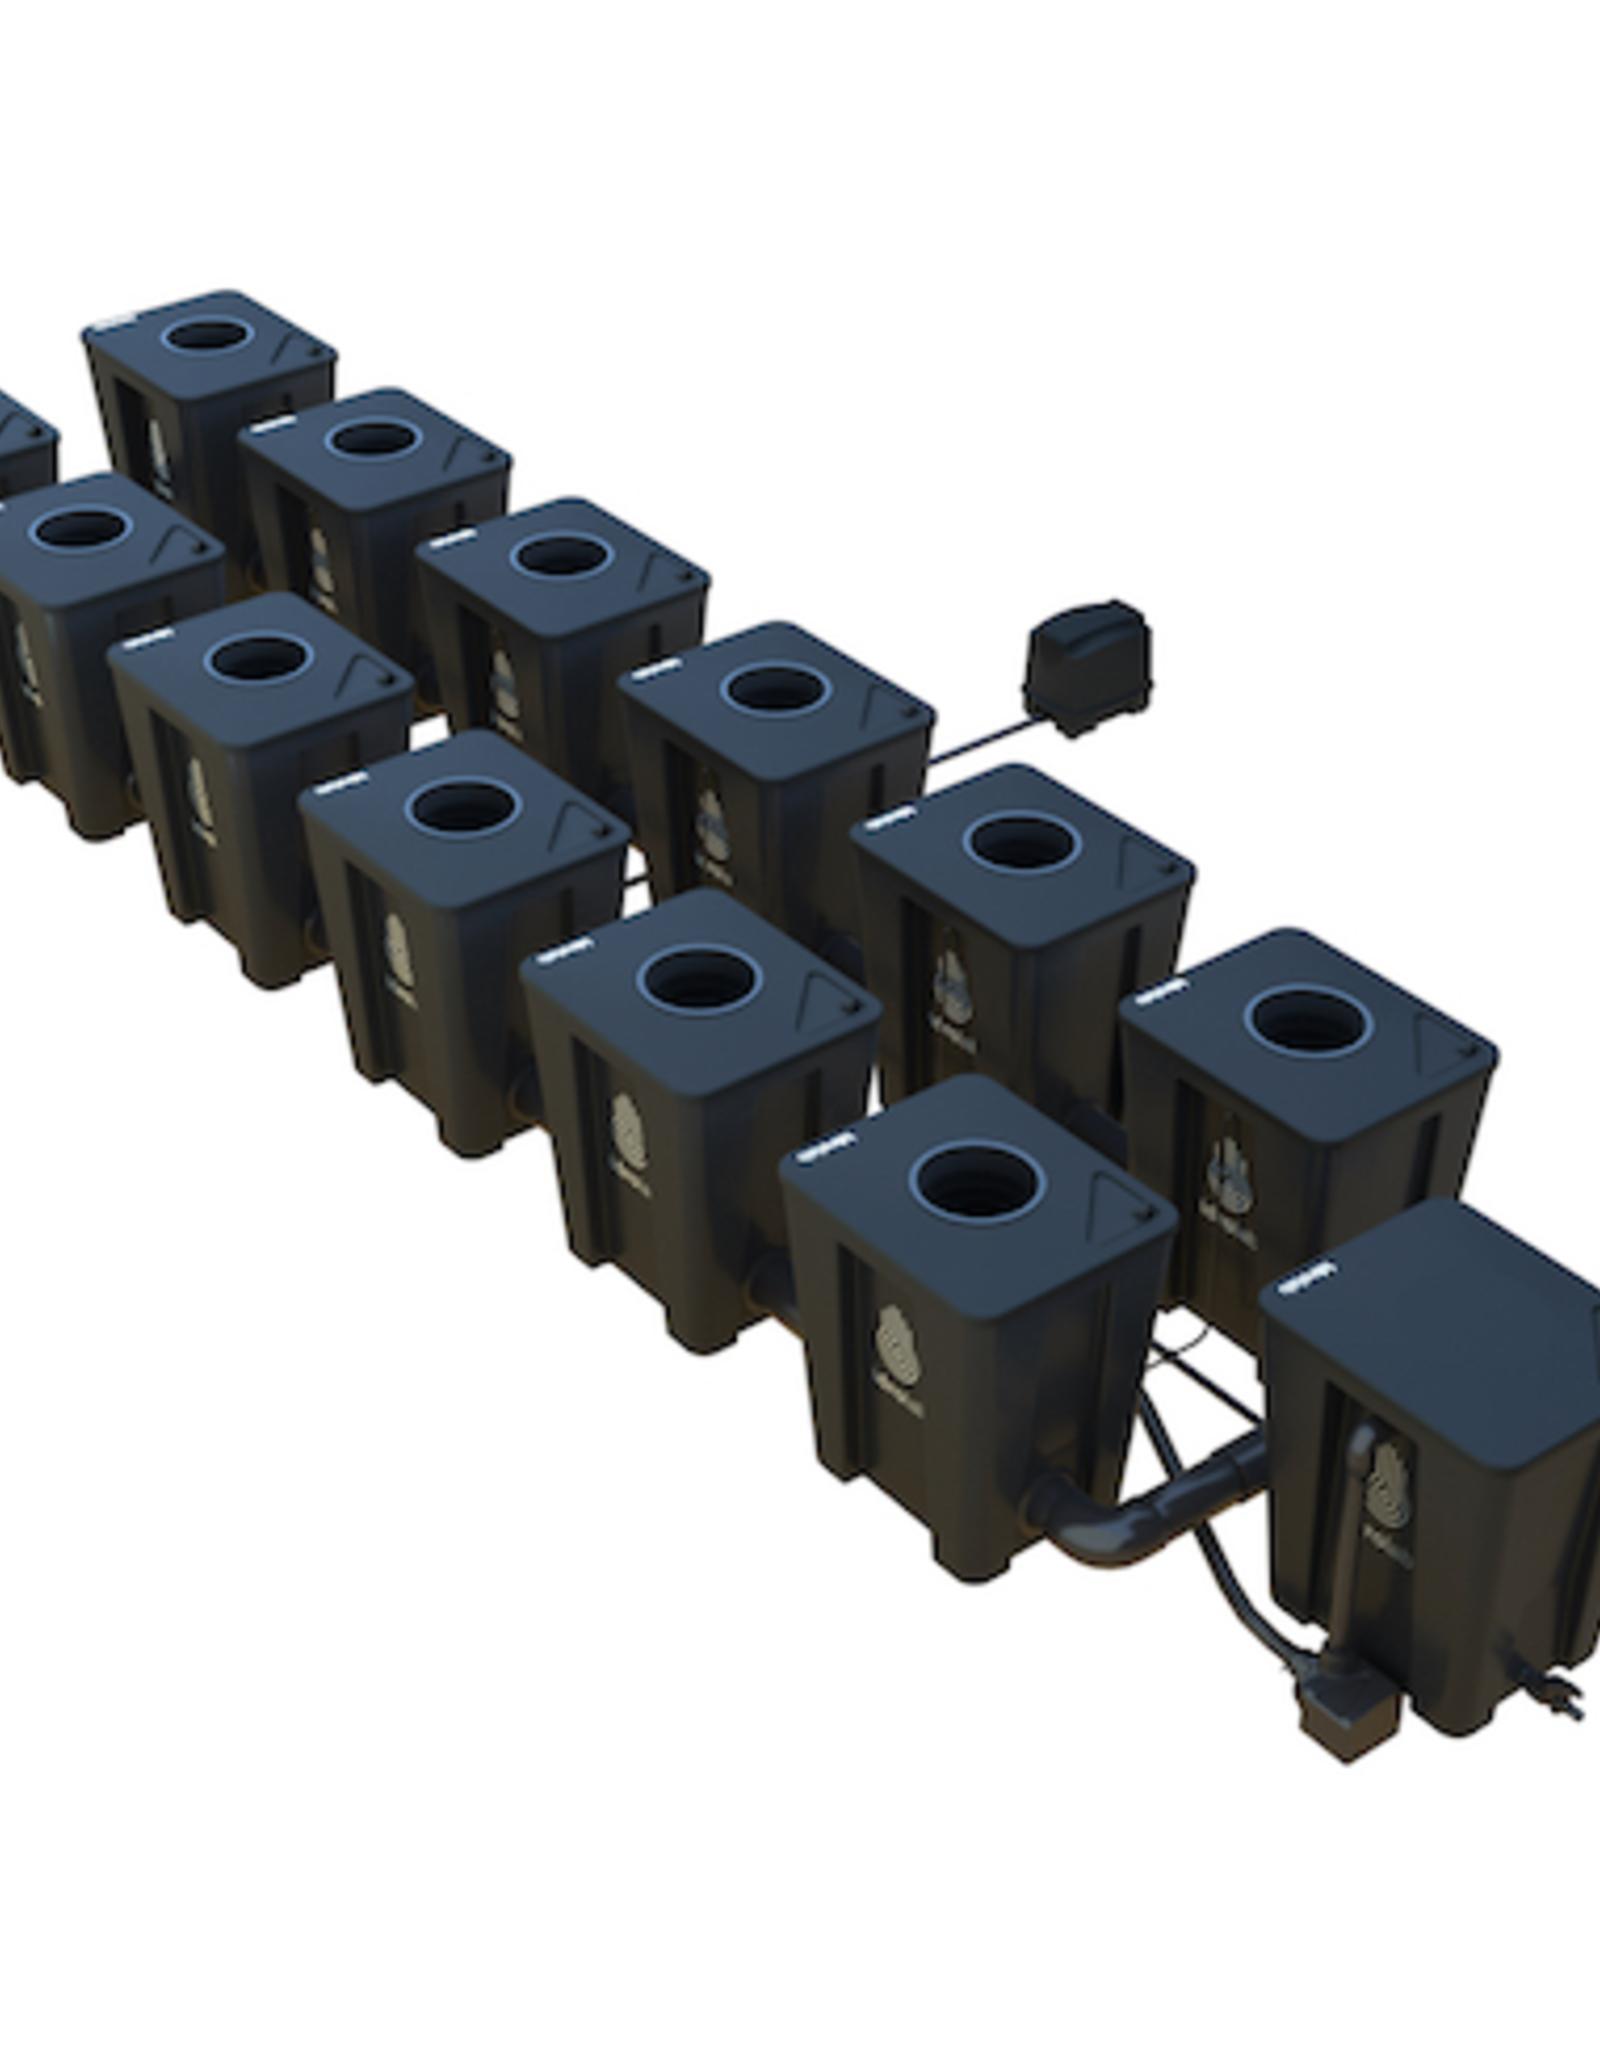 IDROLAB IDROLAB RDWC SYSTEM 2 ORIGINAL 12+1